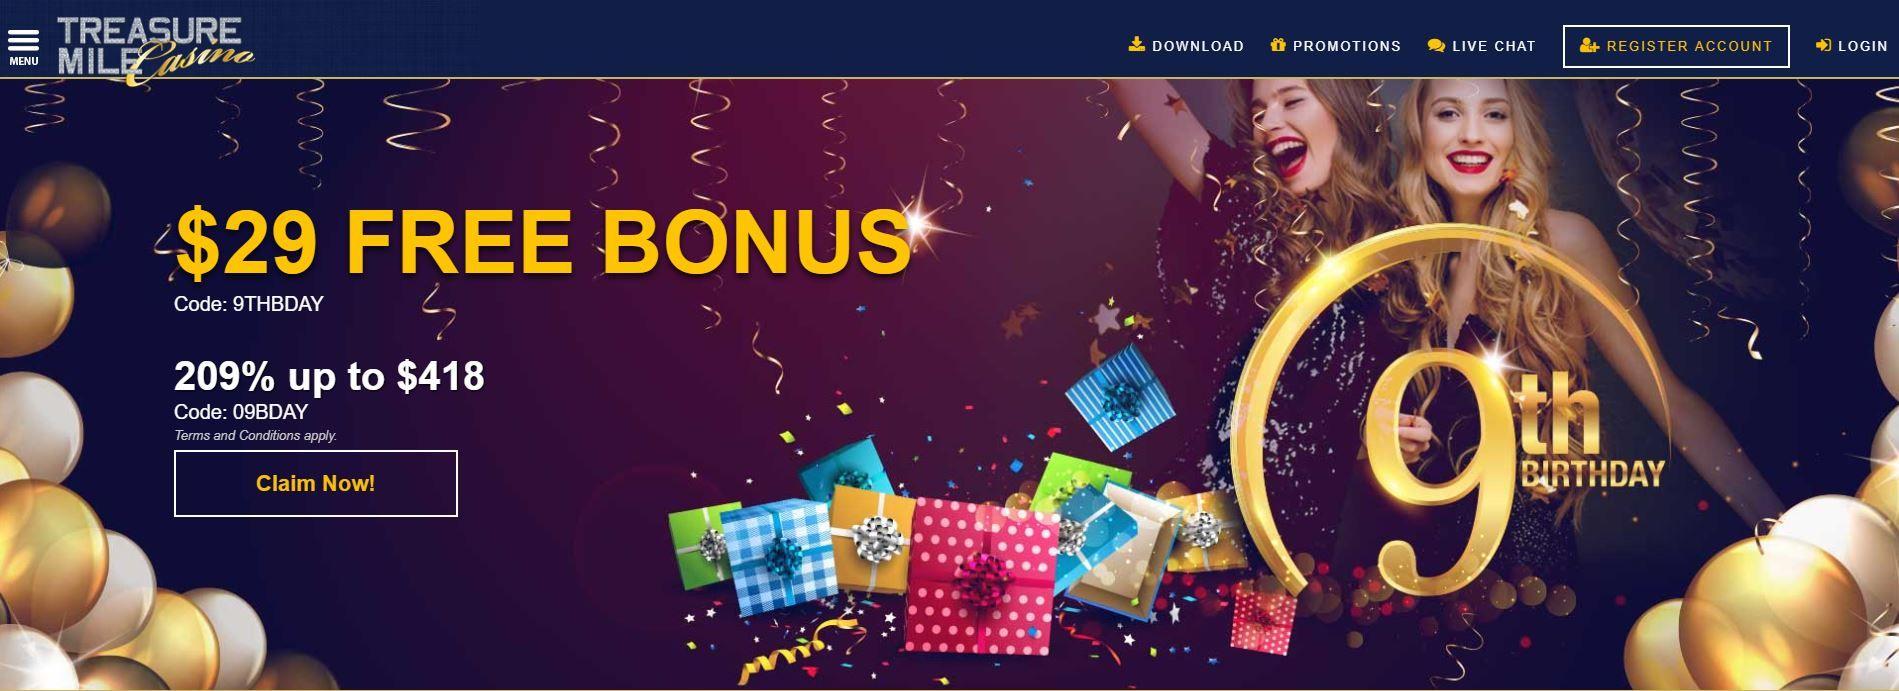 Genesys Club Online Casino